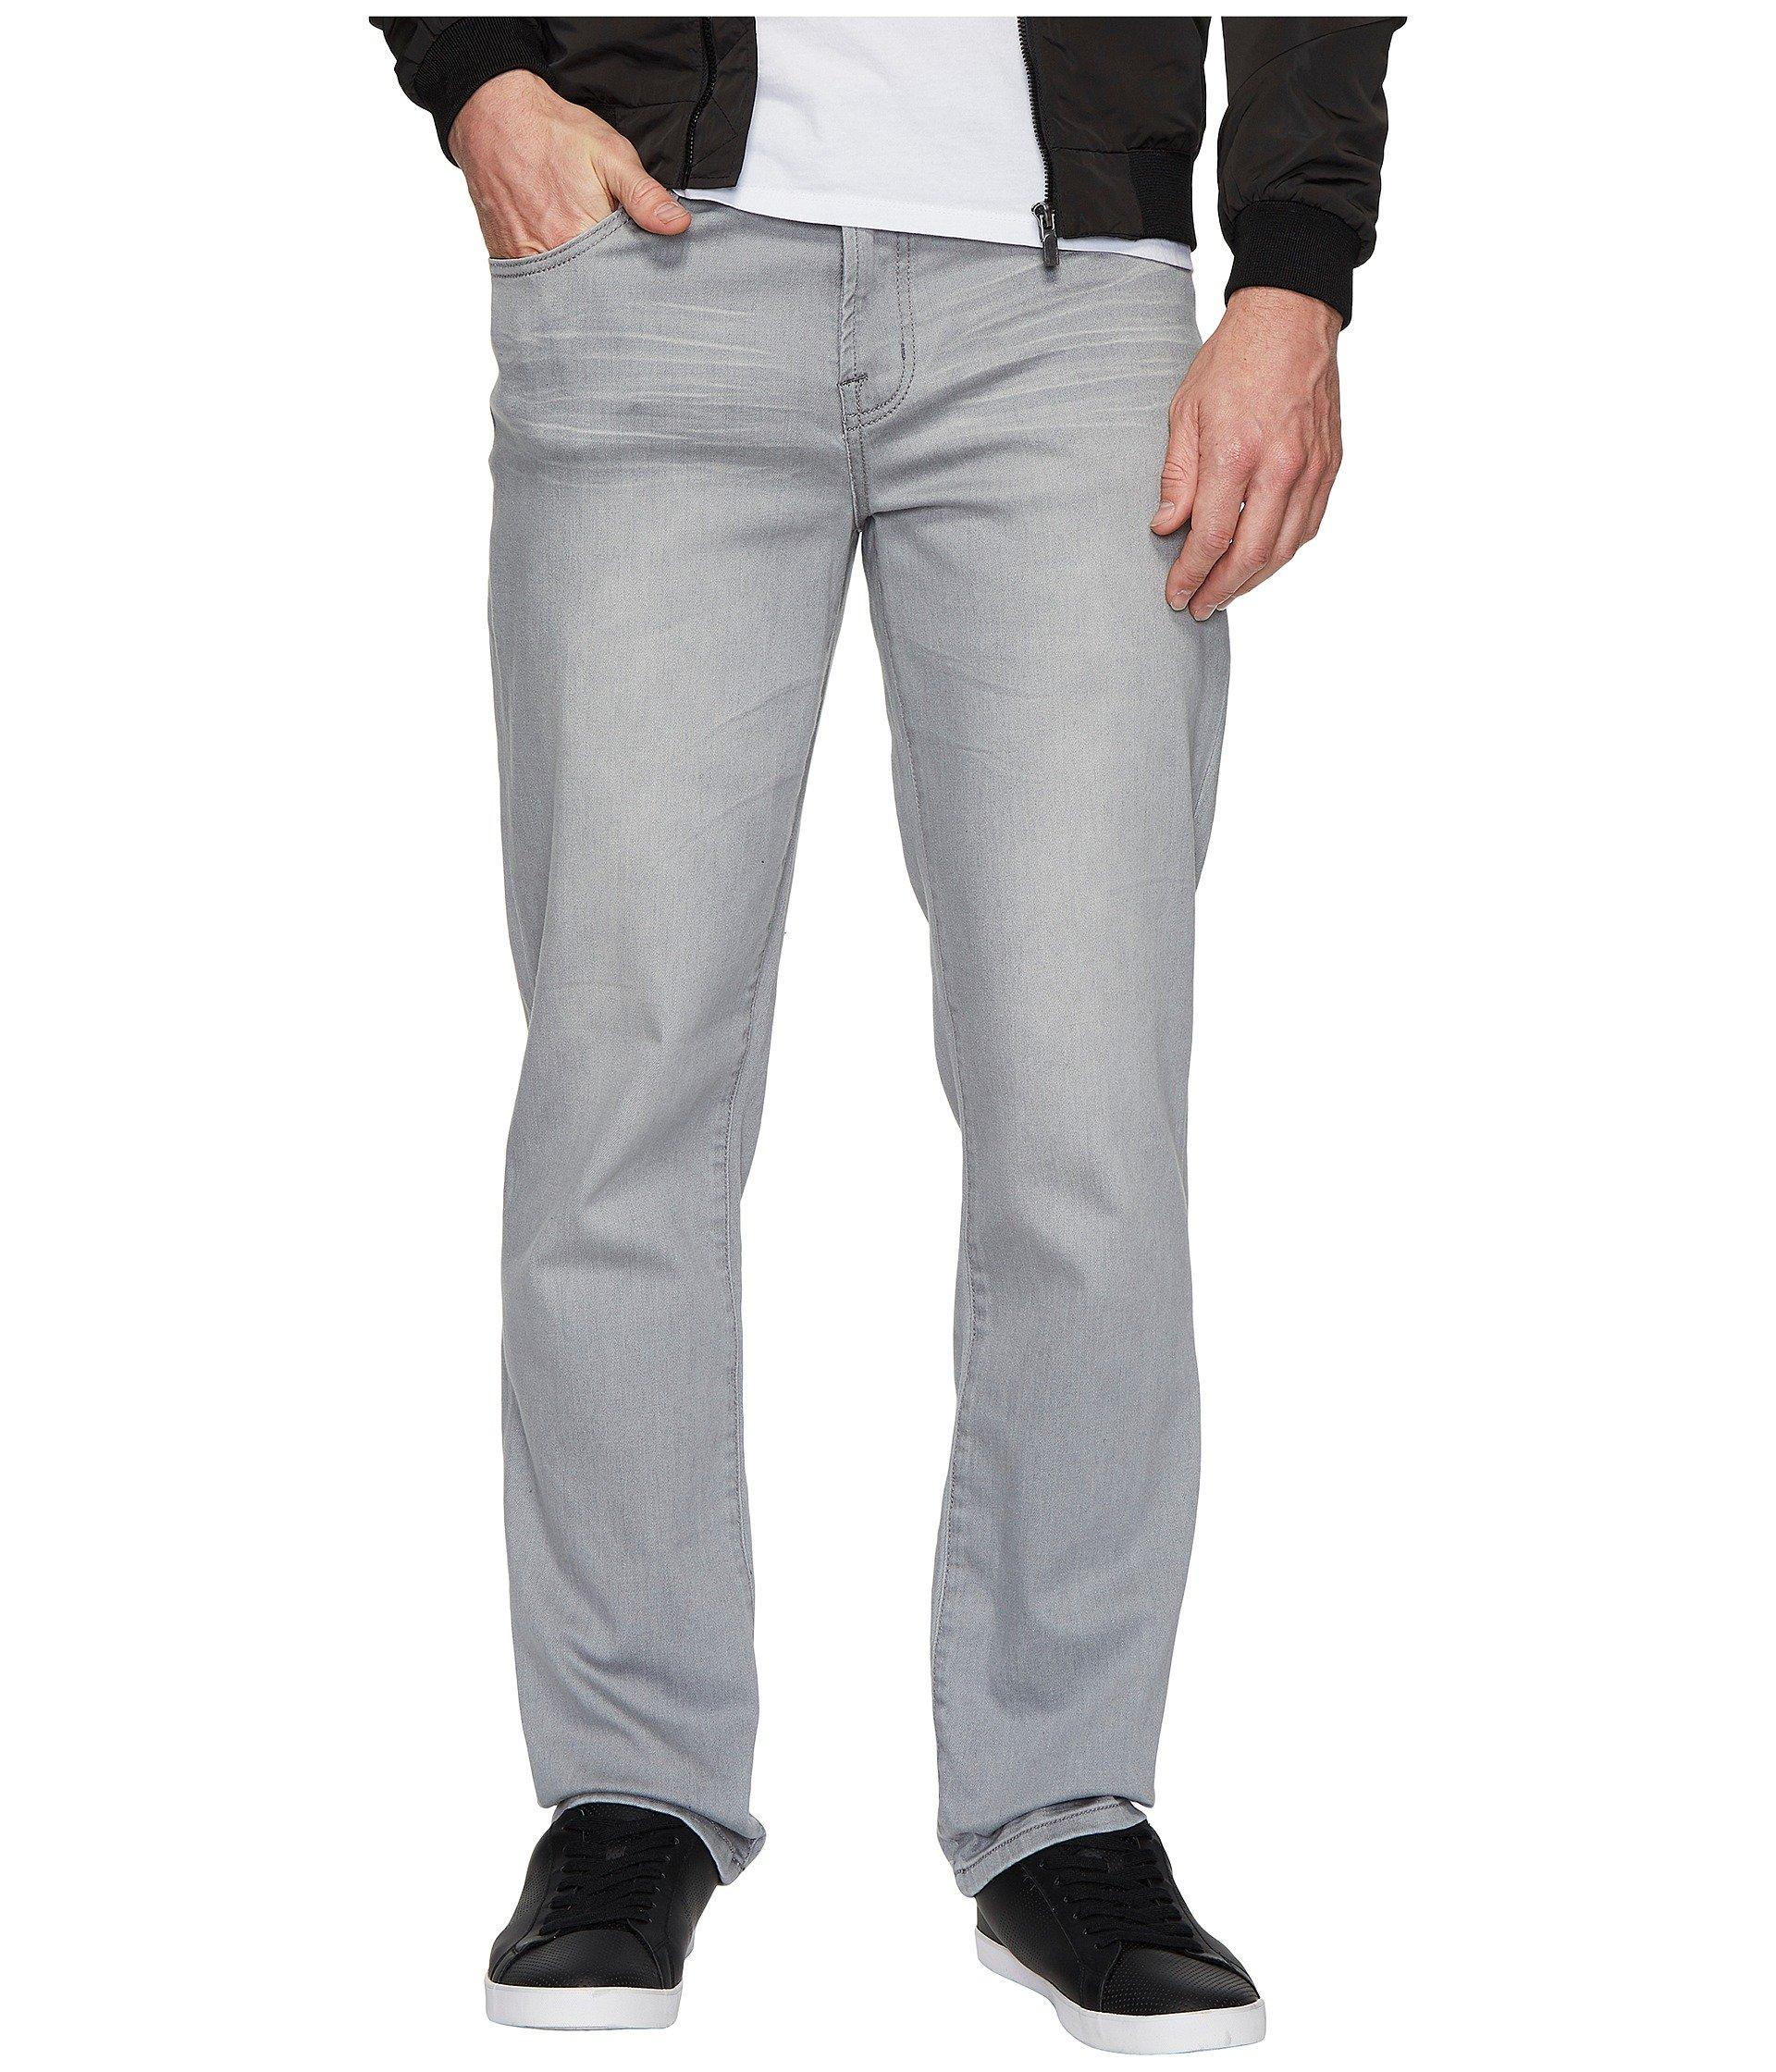 33521c237bf Qué Significa Stretch Jeans En Español - erva-cidreira.info